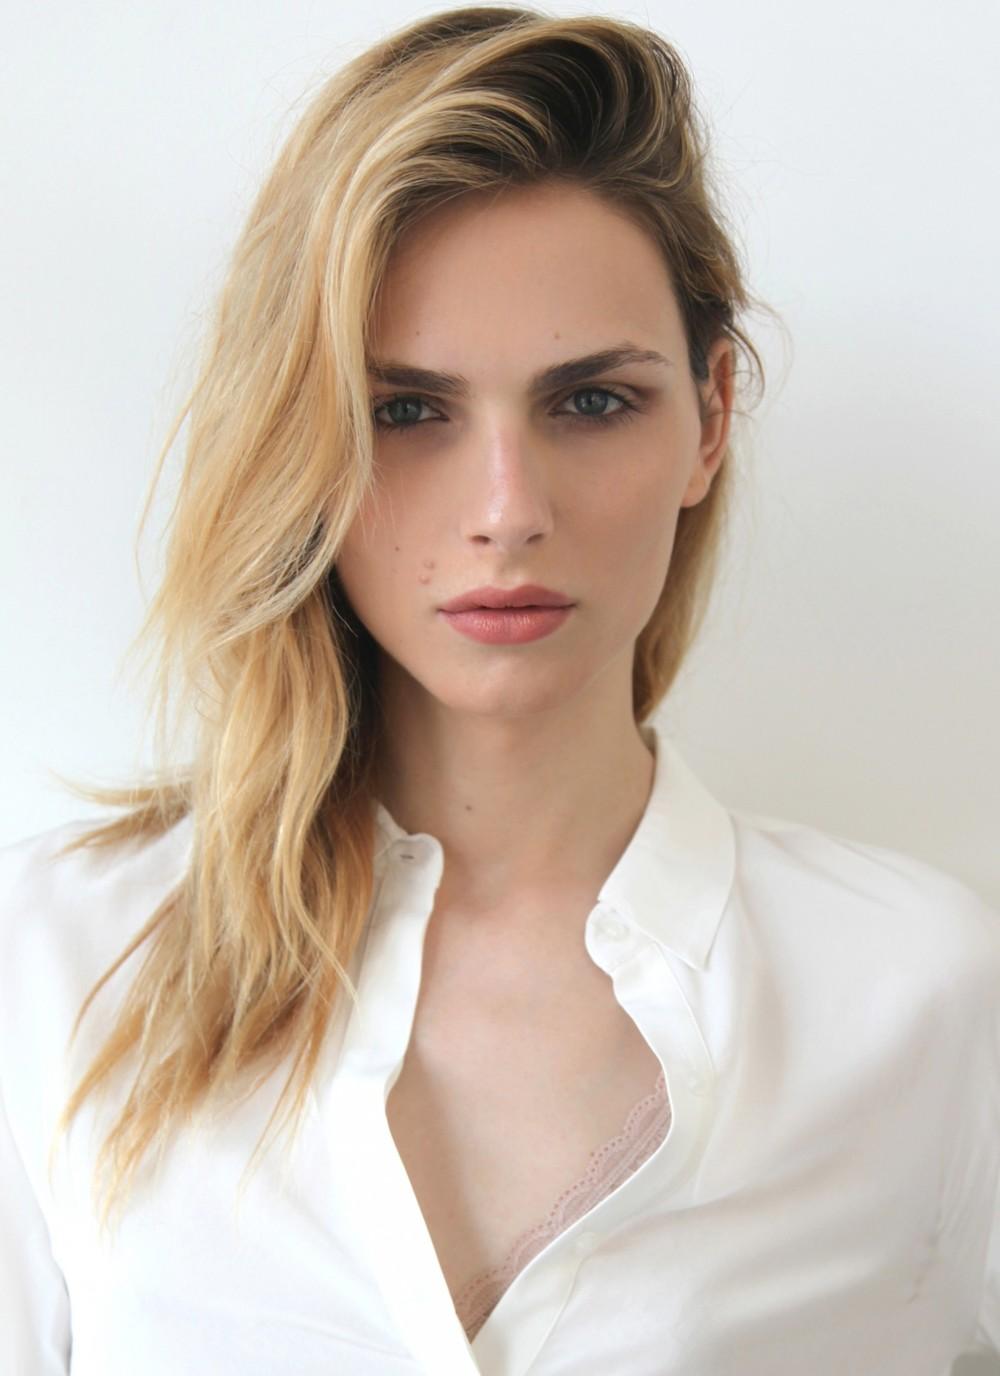 Transgender model,Andreja Pejic